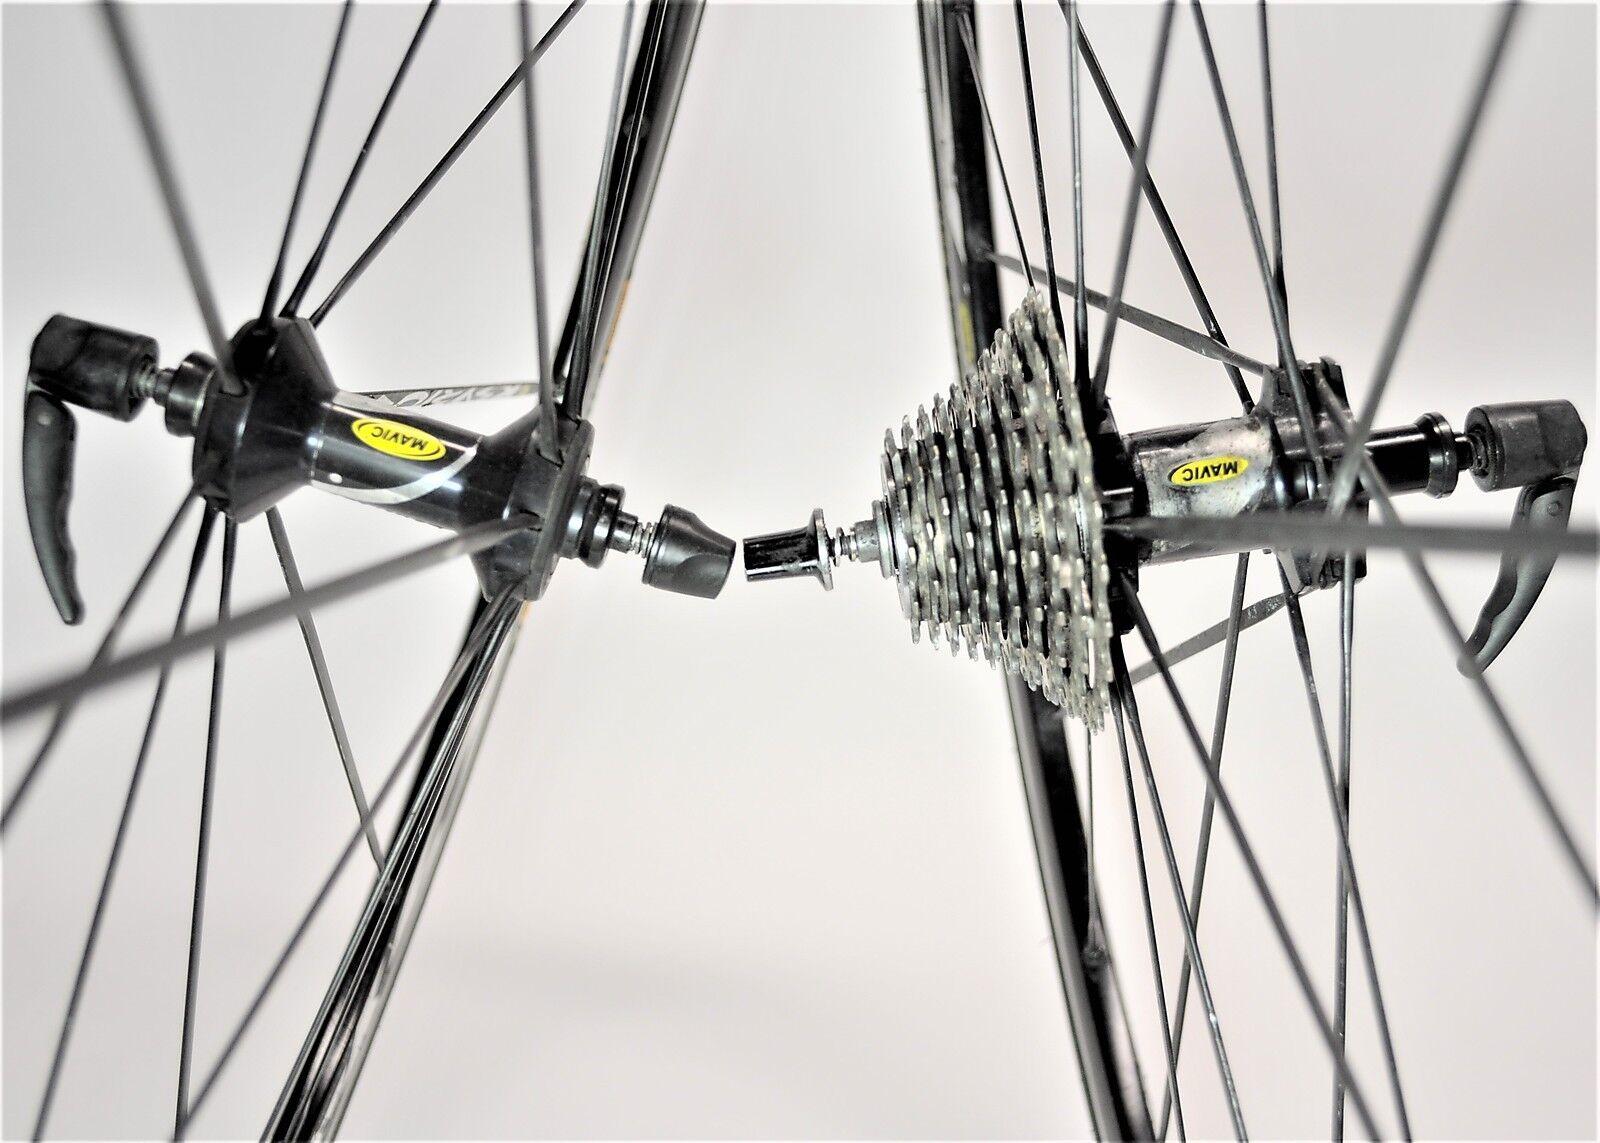 VINTAGE MAVIC KSYRIUM SSC SHIMANO 10 SPEED ROAD BICYCLE 700C WHEEL SET 130 MM